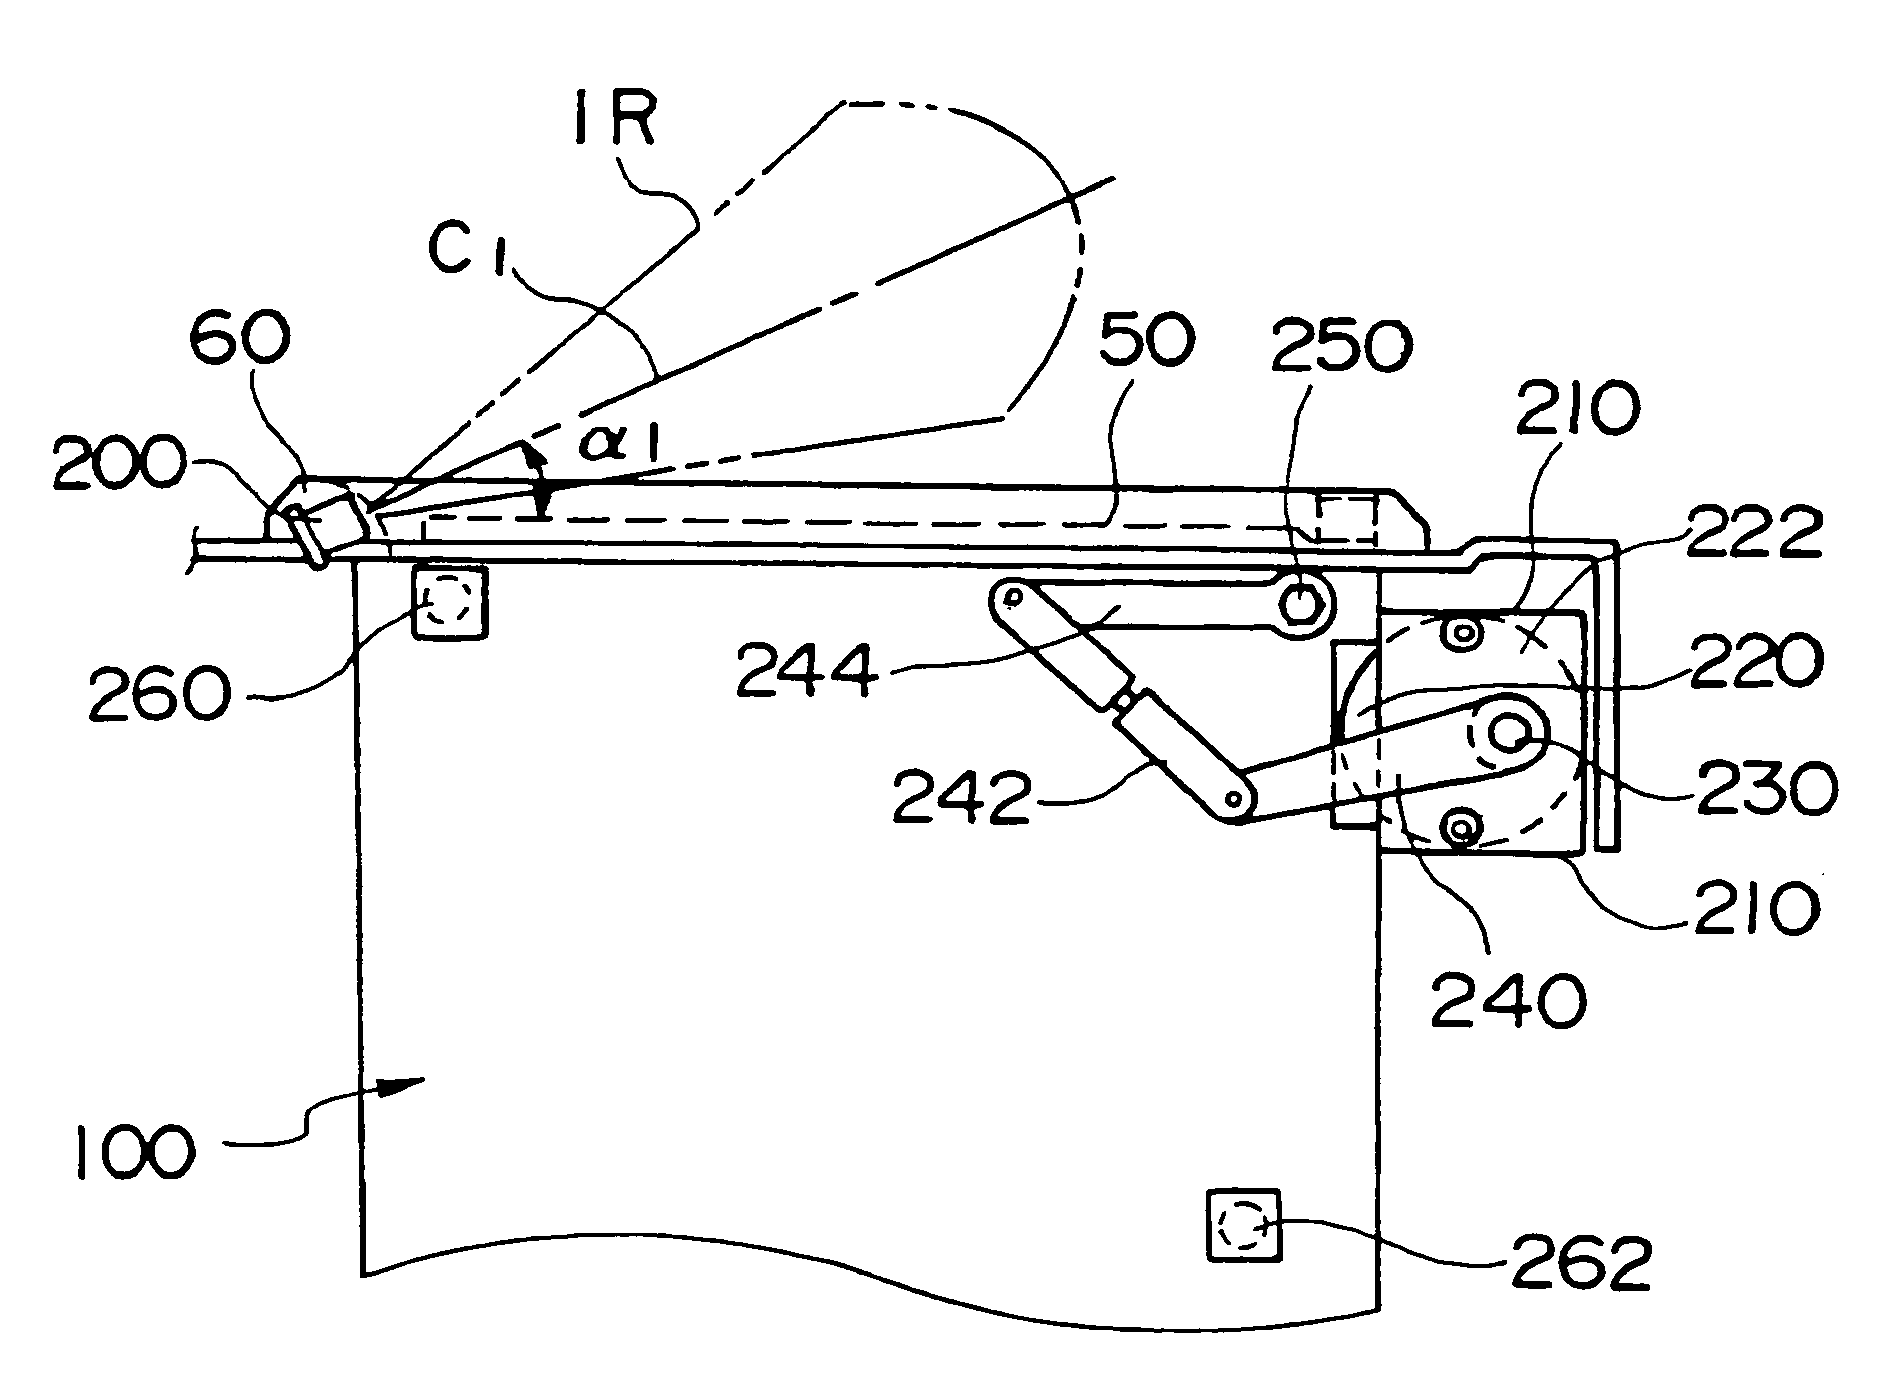 Wiring Diagram For Motion Sensor Trash Can : 42 Wiring